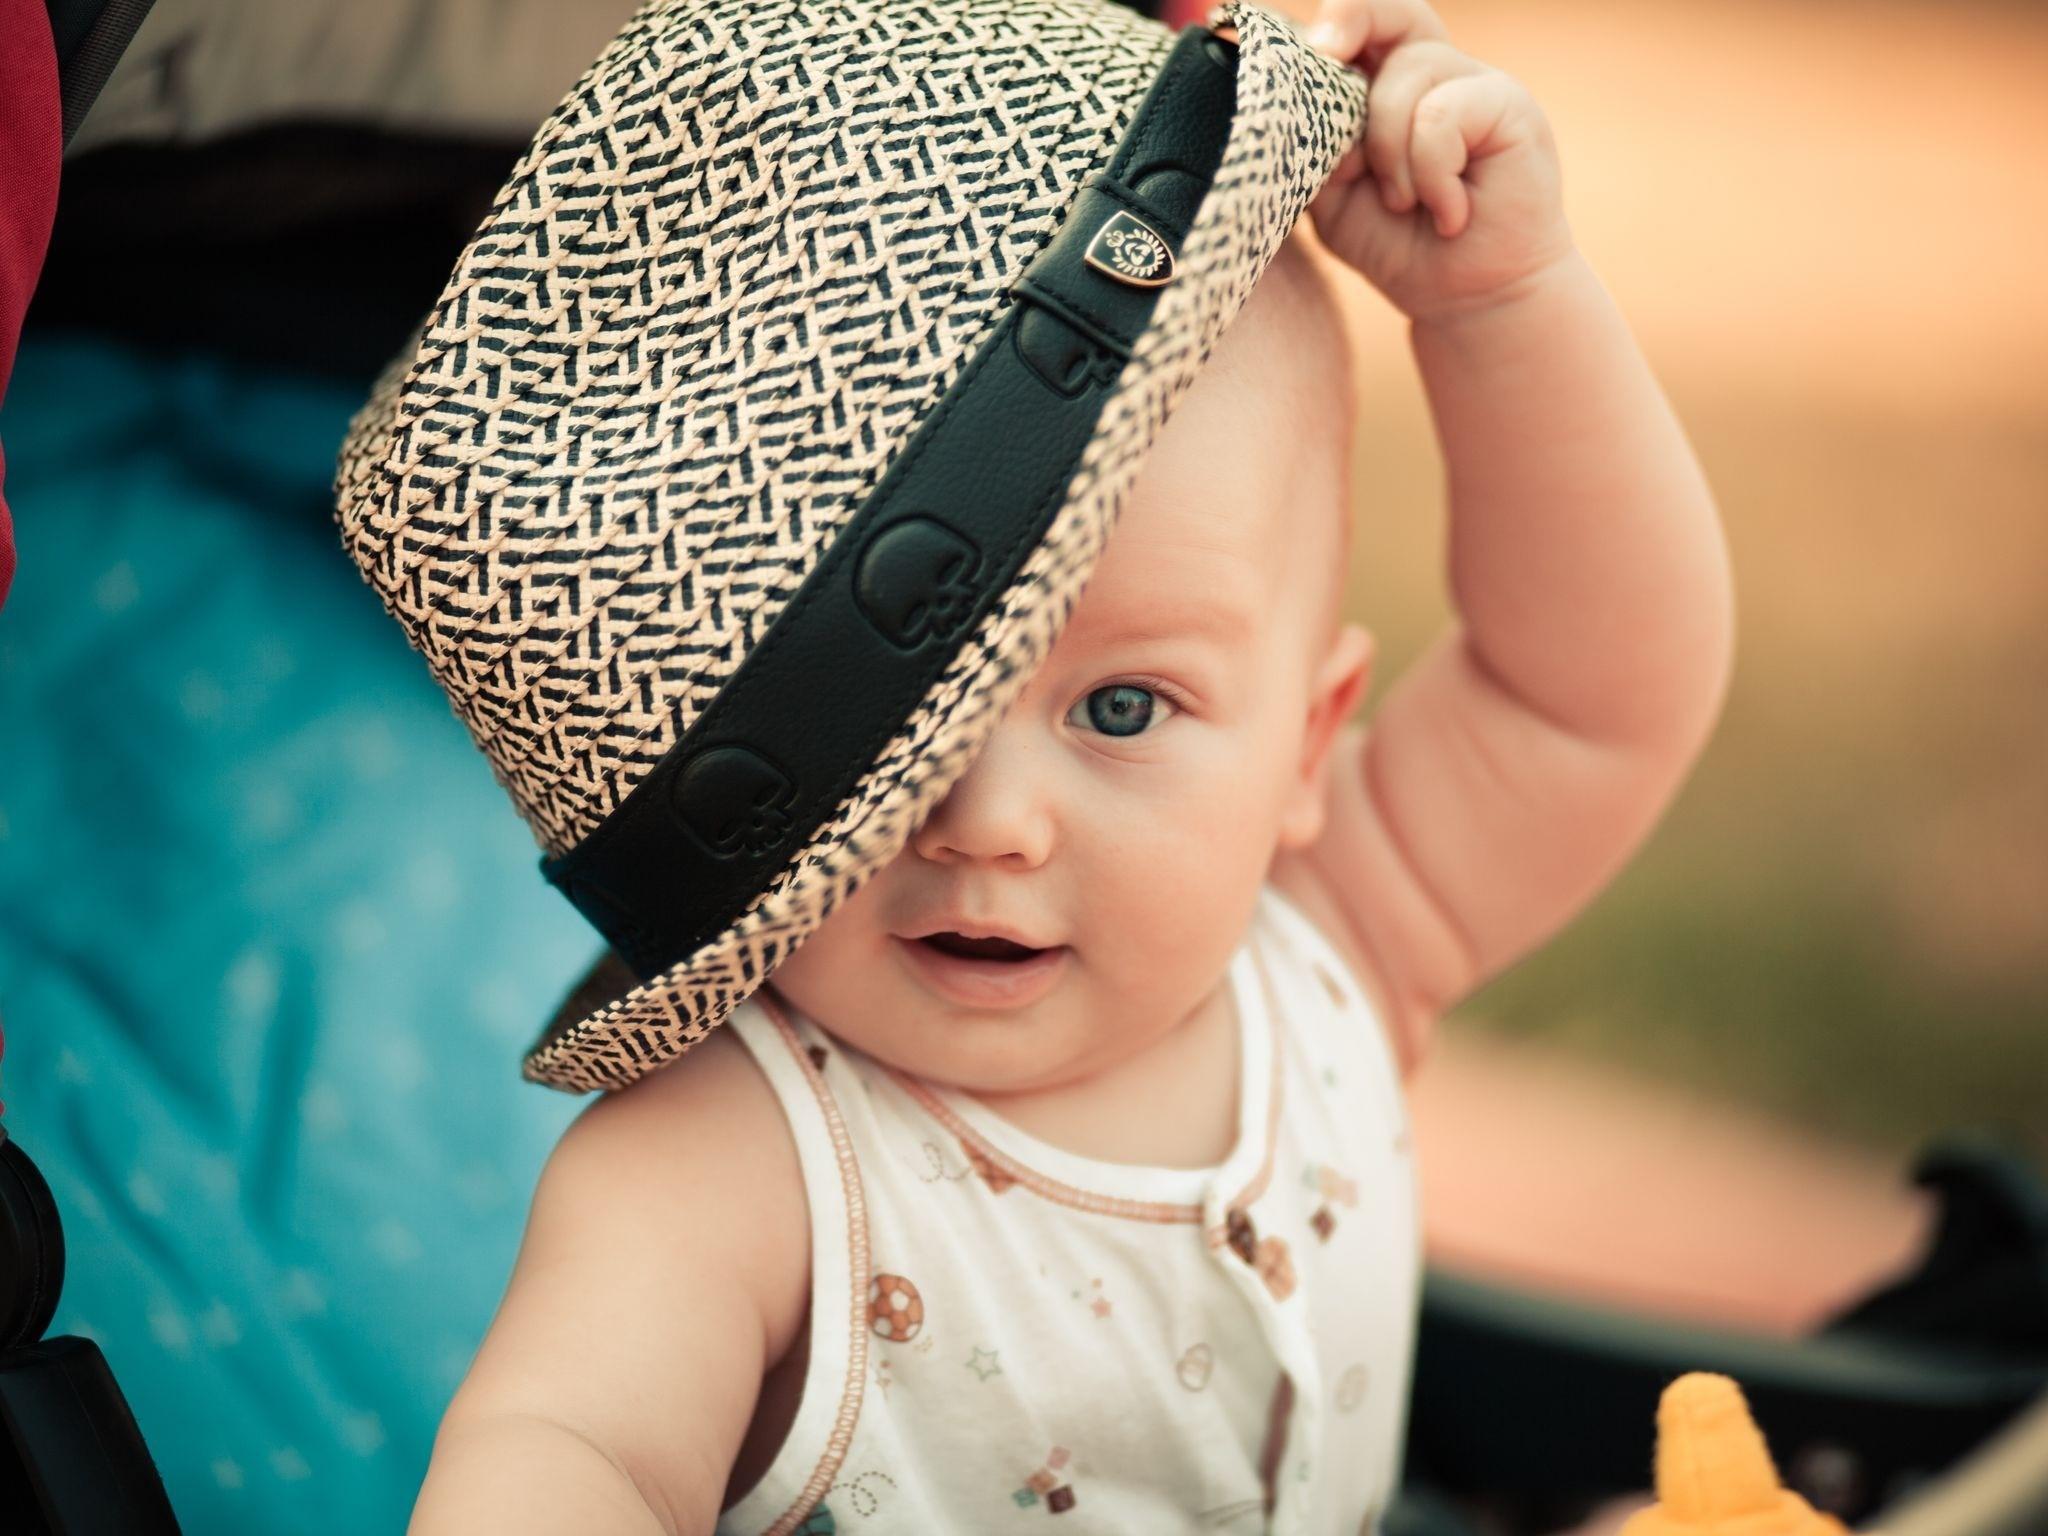 بالصور صور اولاد حلوين , شاهد بالصور اجمل الاطفال الاولاد 429 15